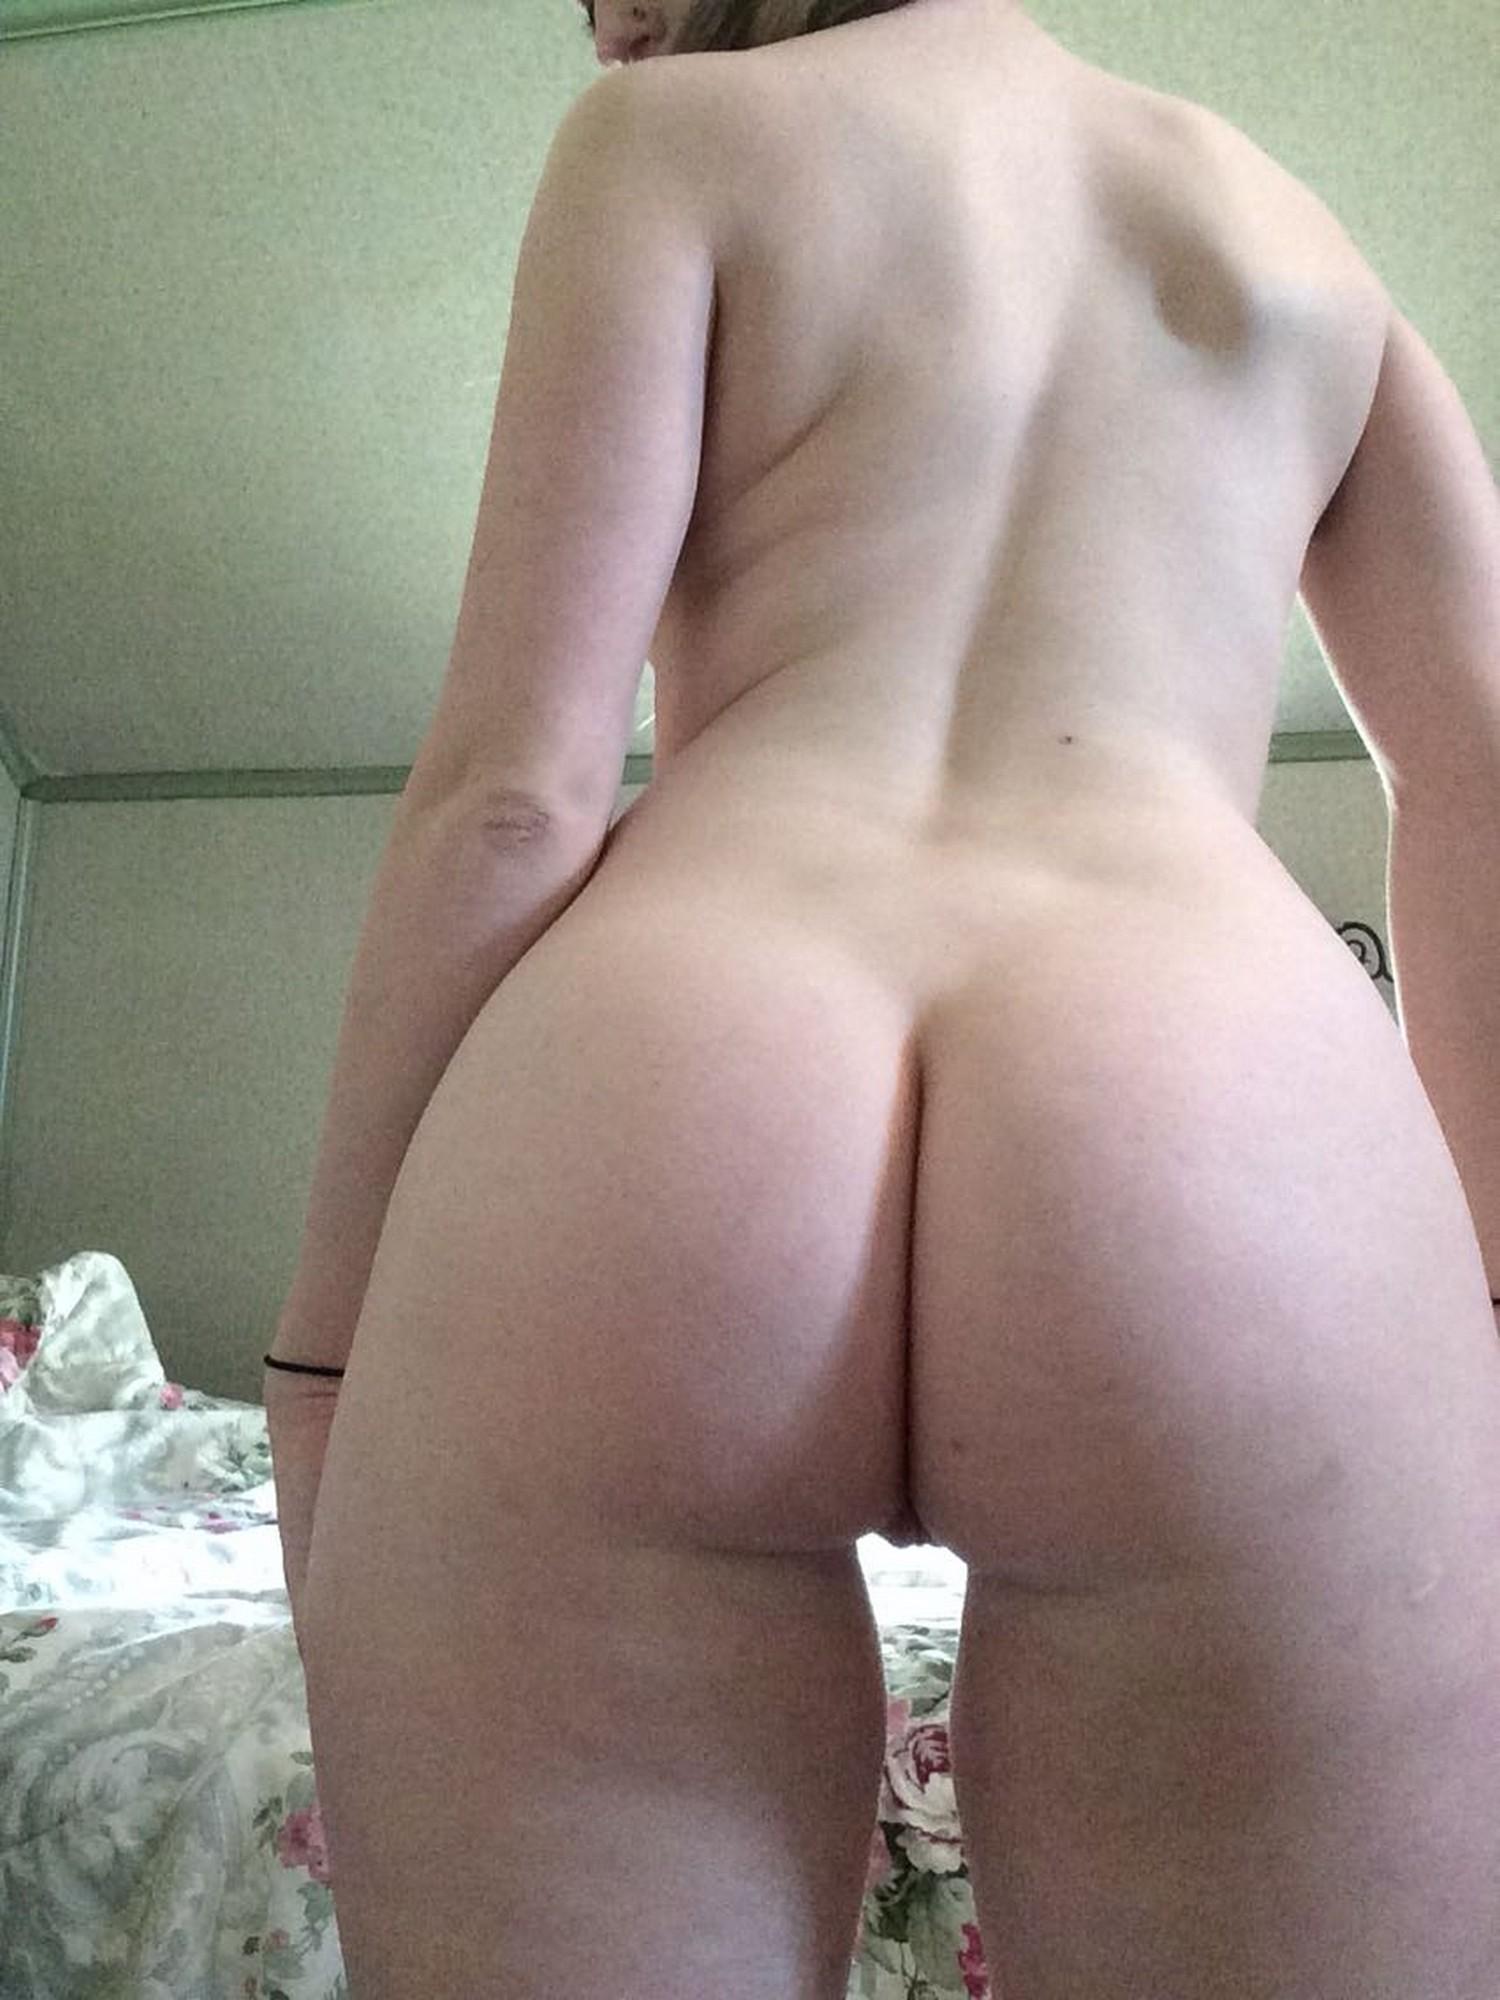 Домашние снимки жопастой неформалки с пирсингом в сосках секс фото и порно фото